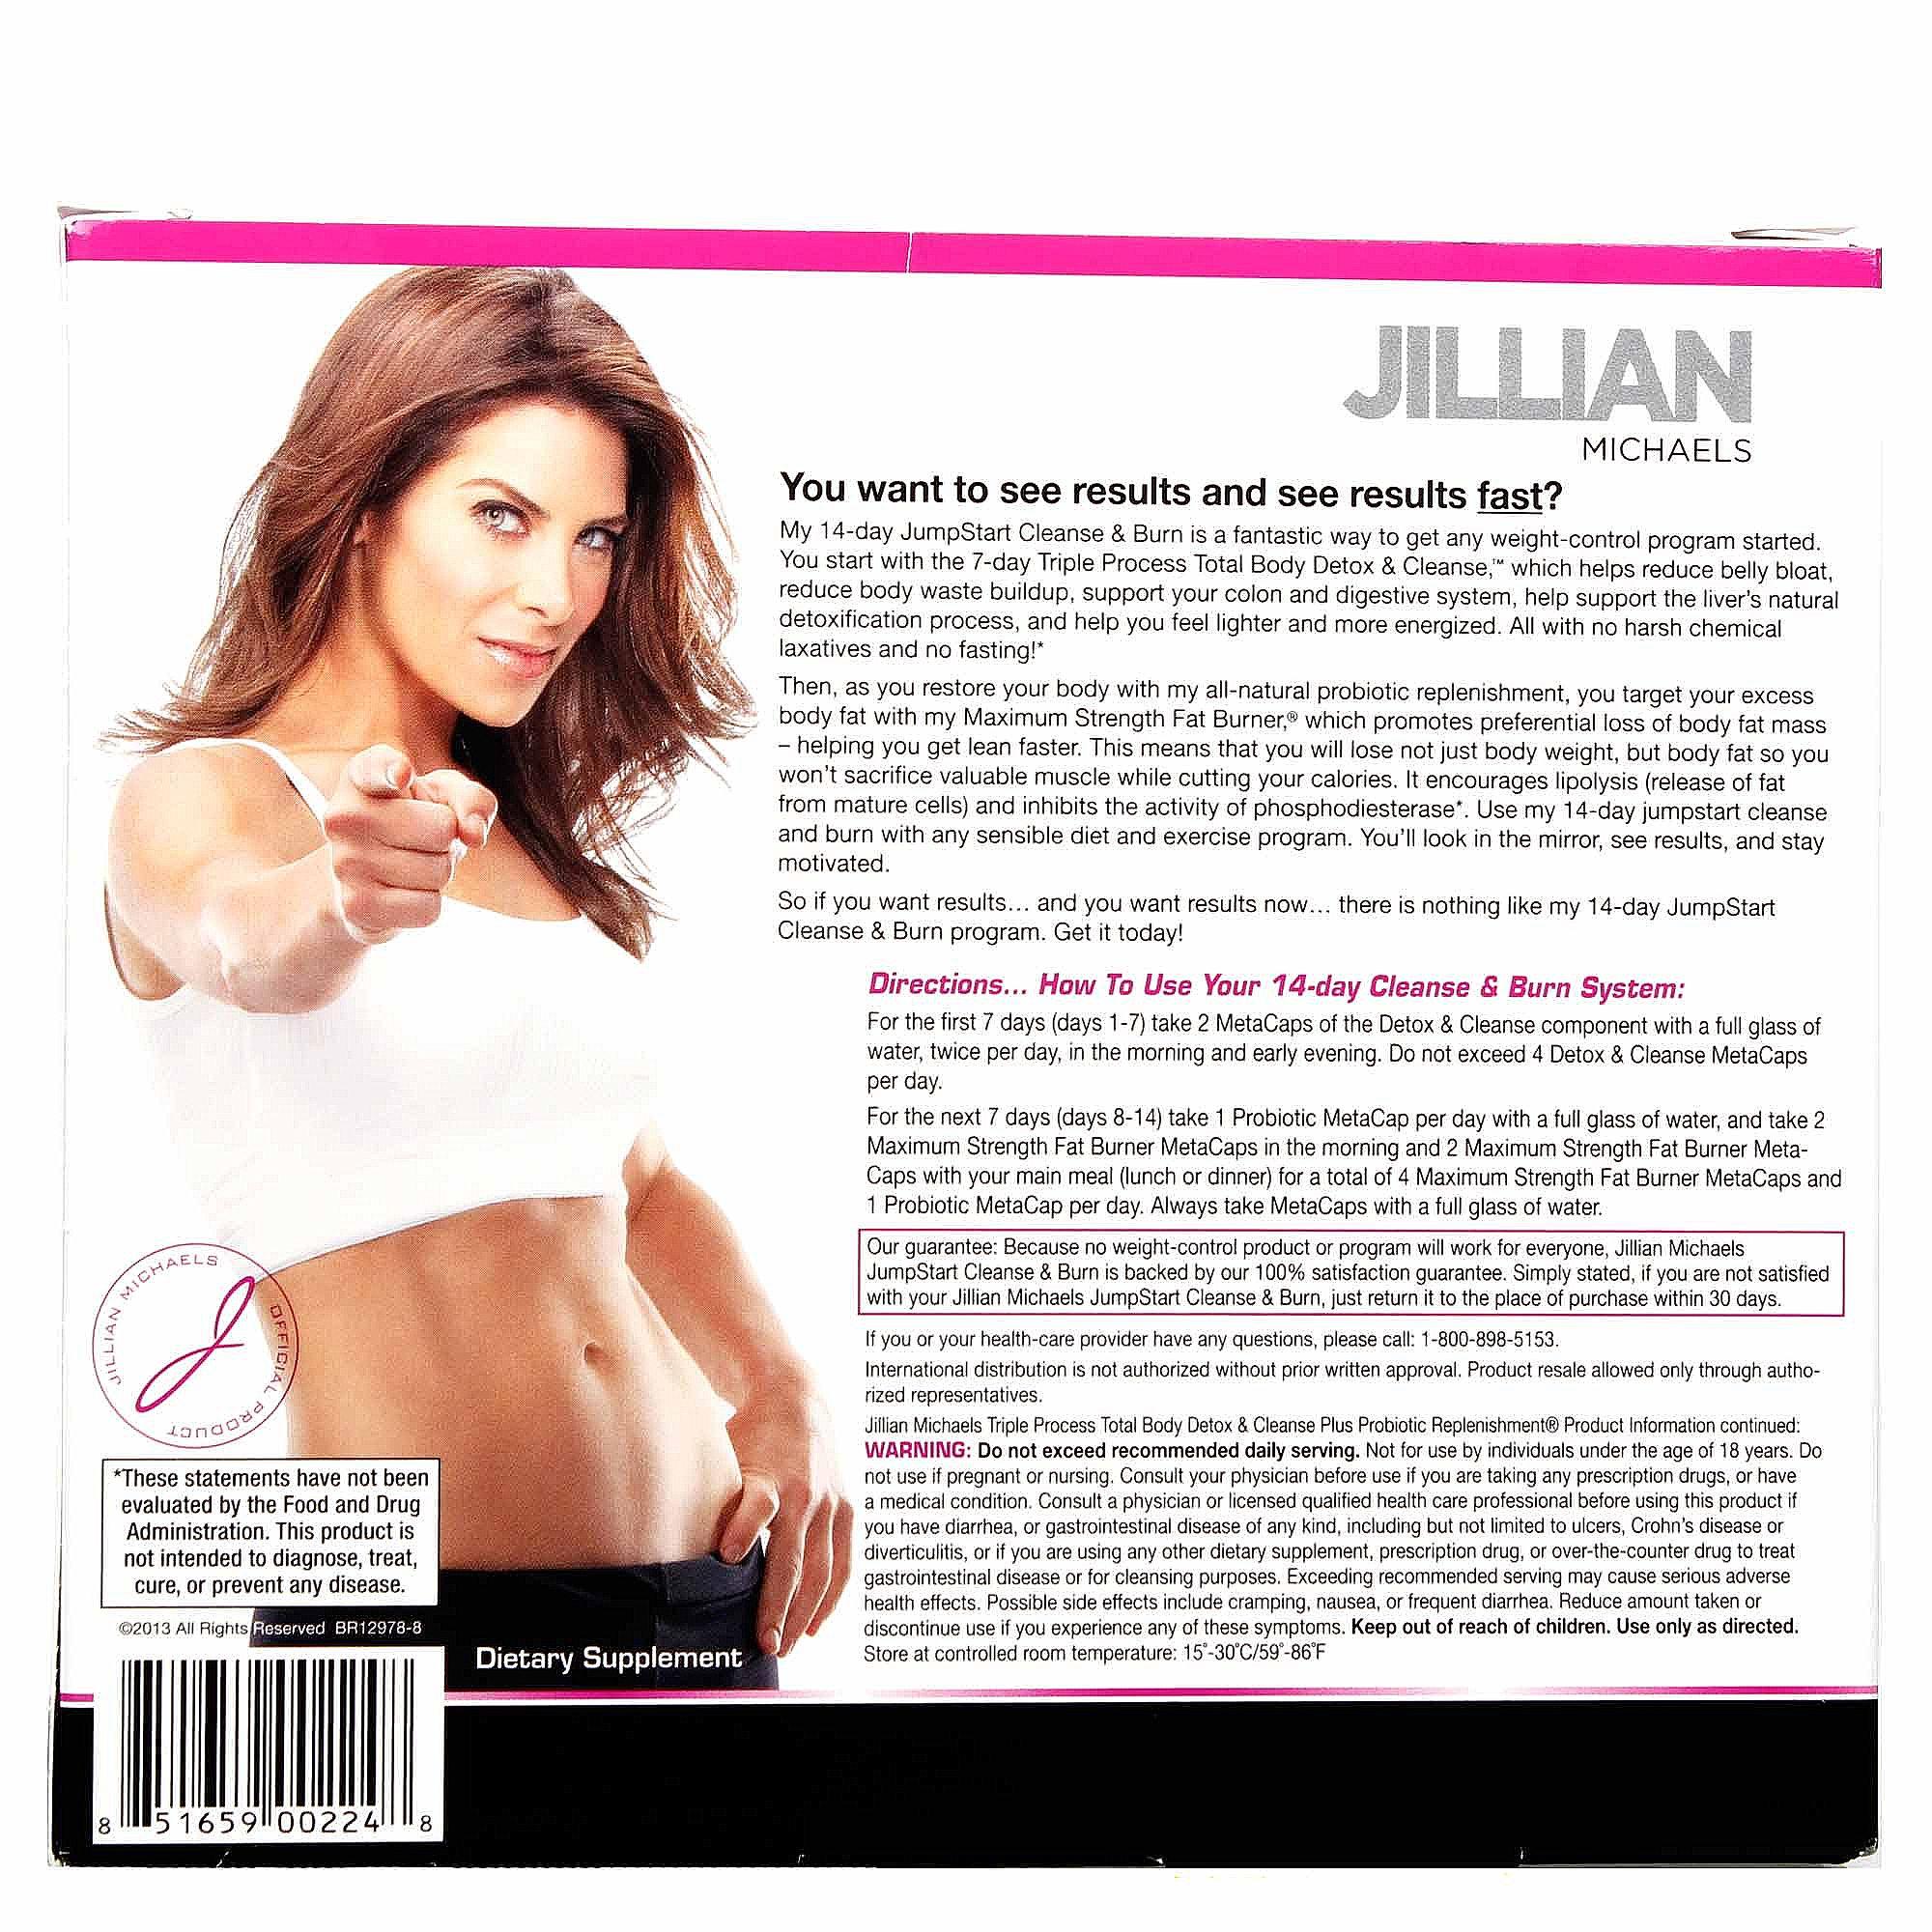 Jillian cleanse and burn